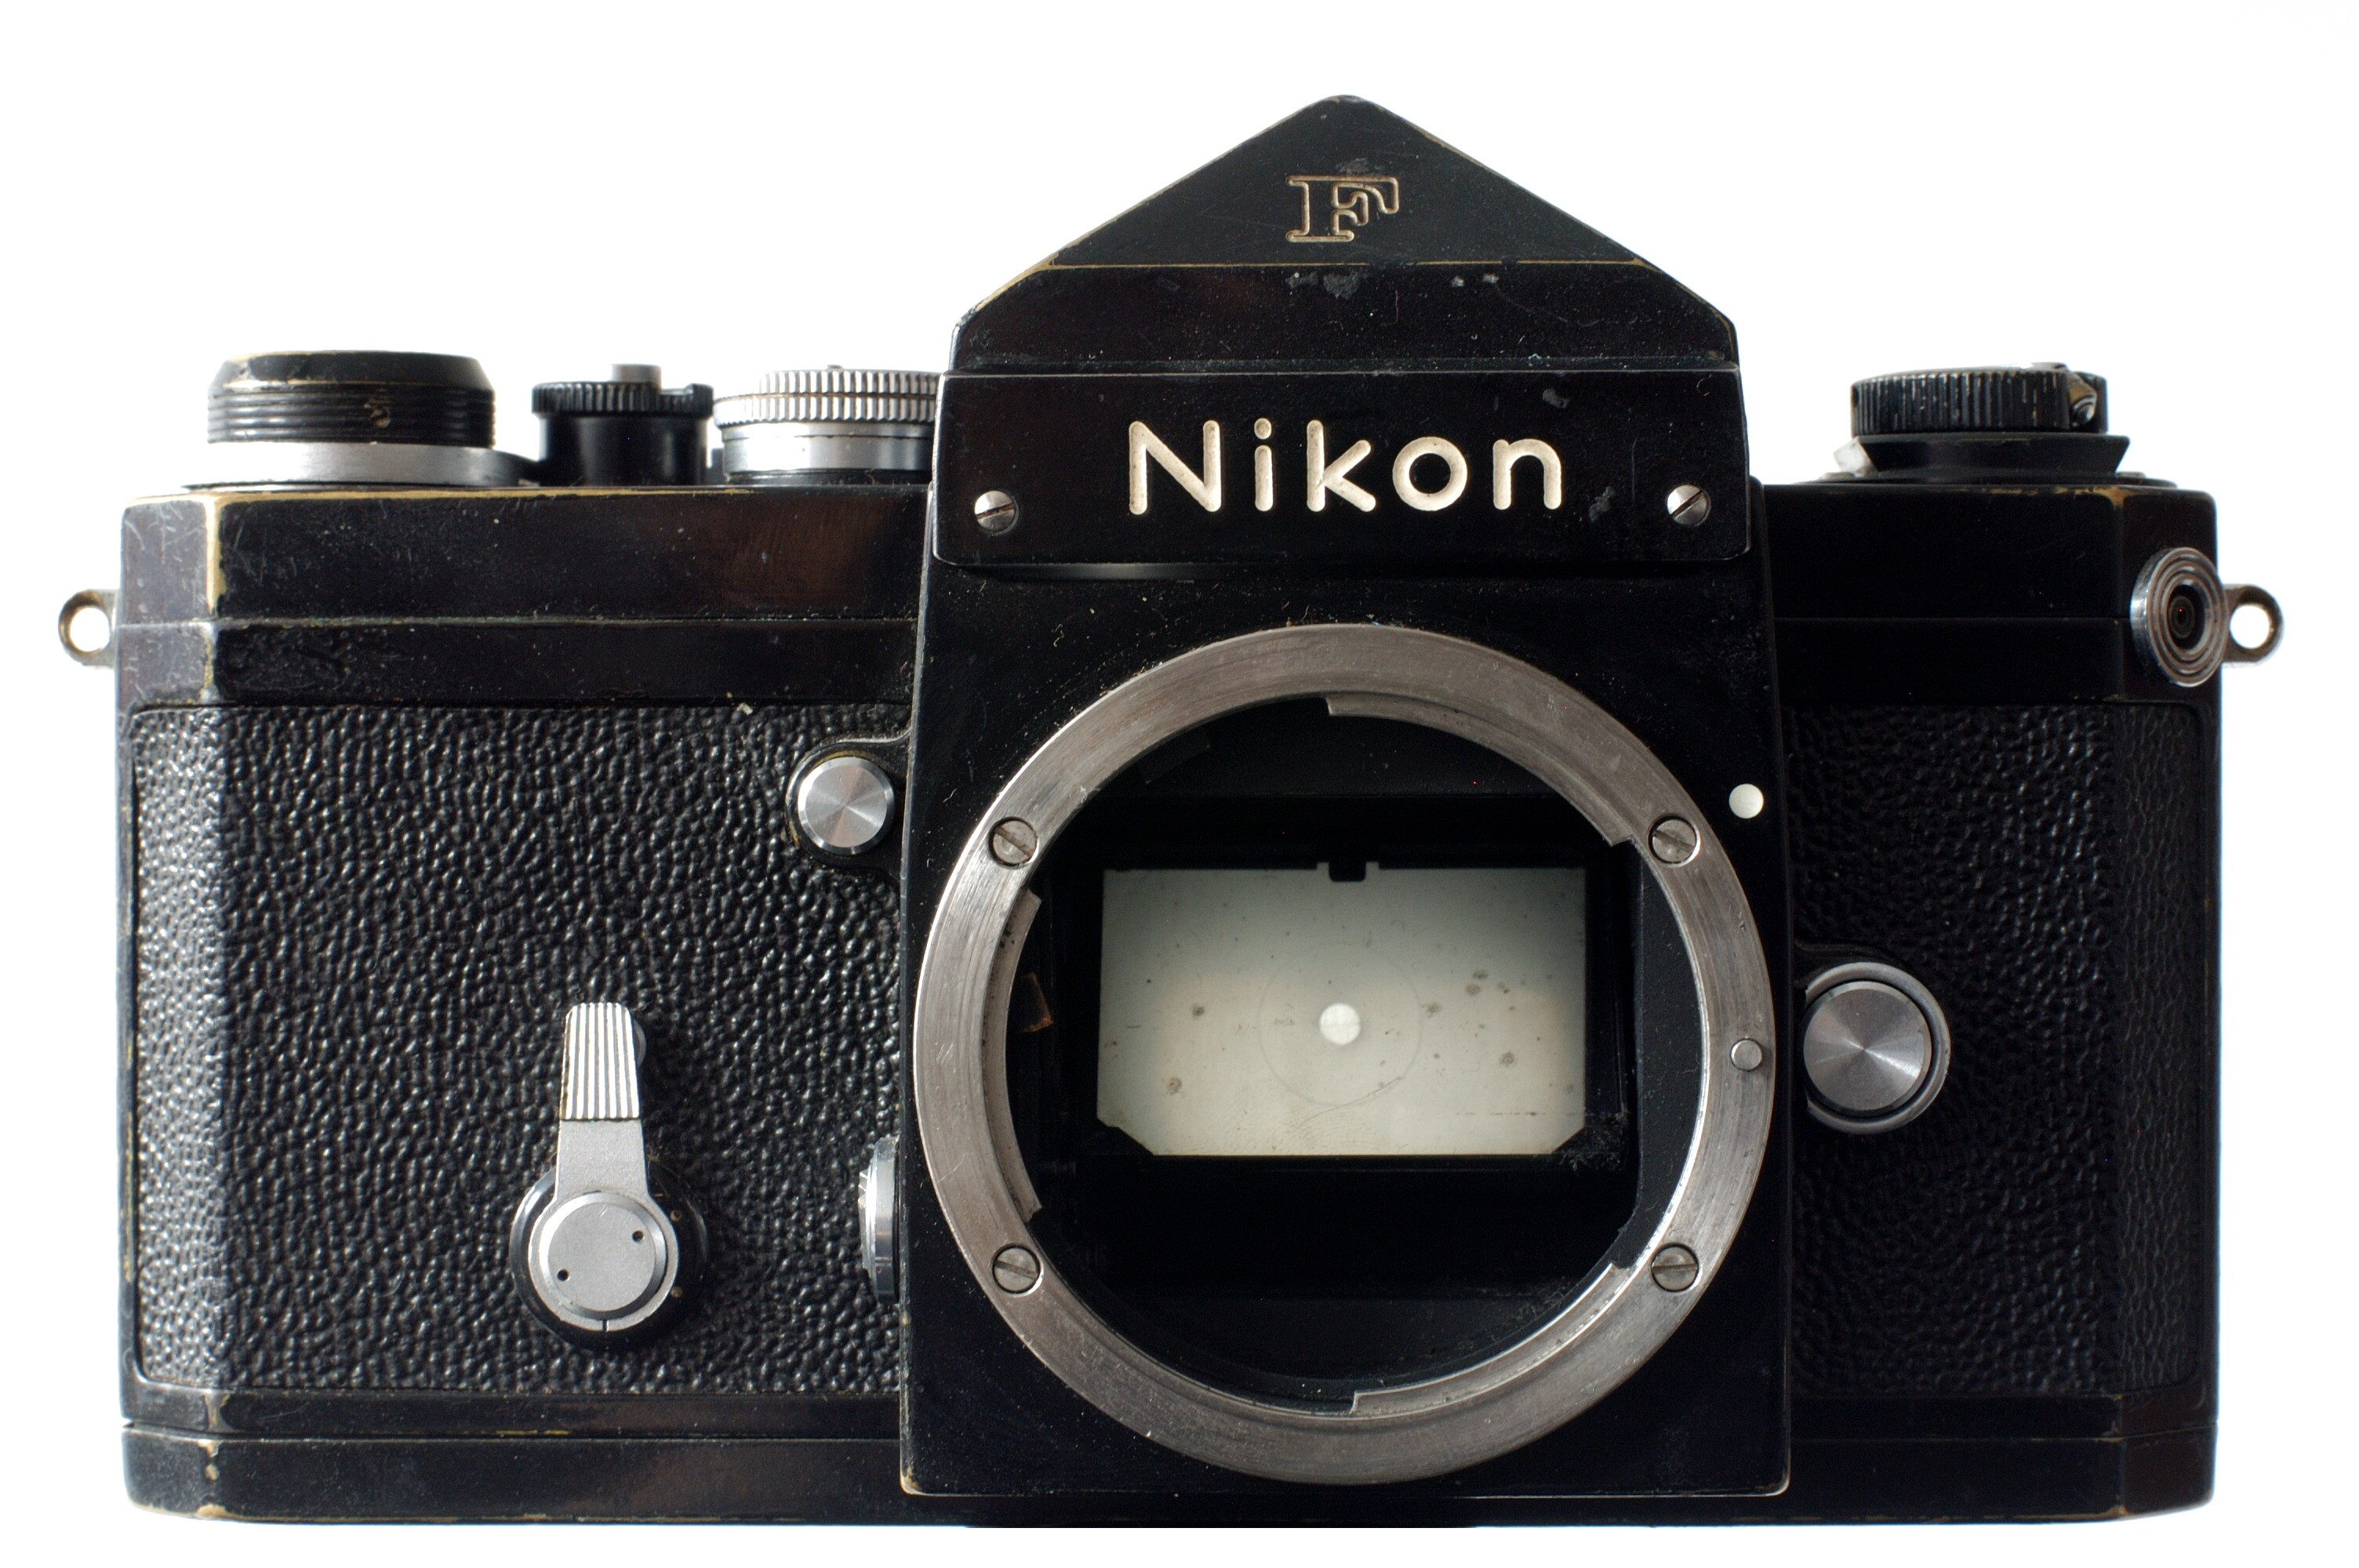 <b>ニコンの銀塩一眼レフカメラ製品一覧</b> - Wikipedia